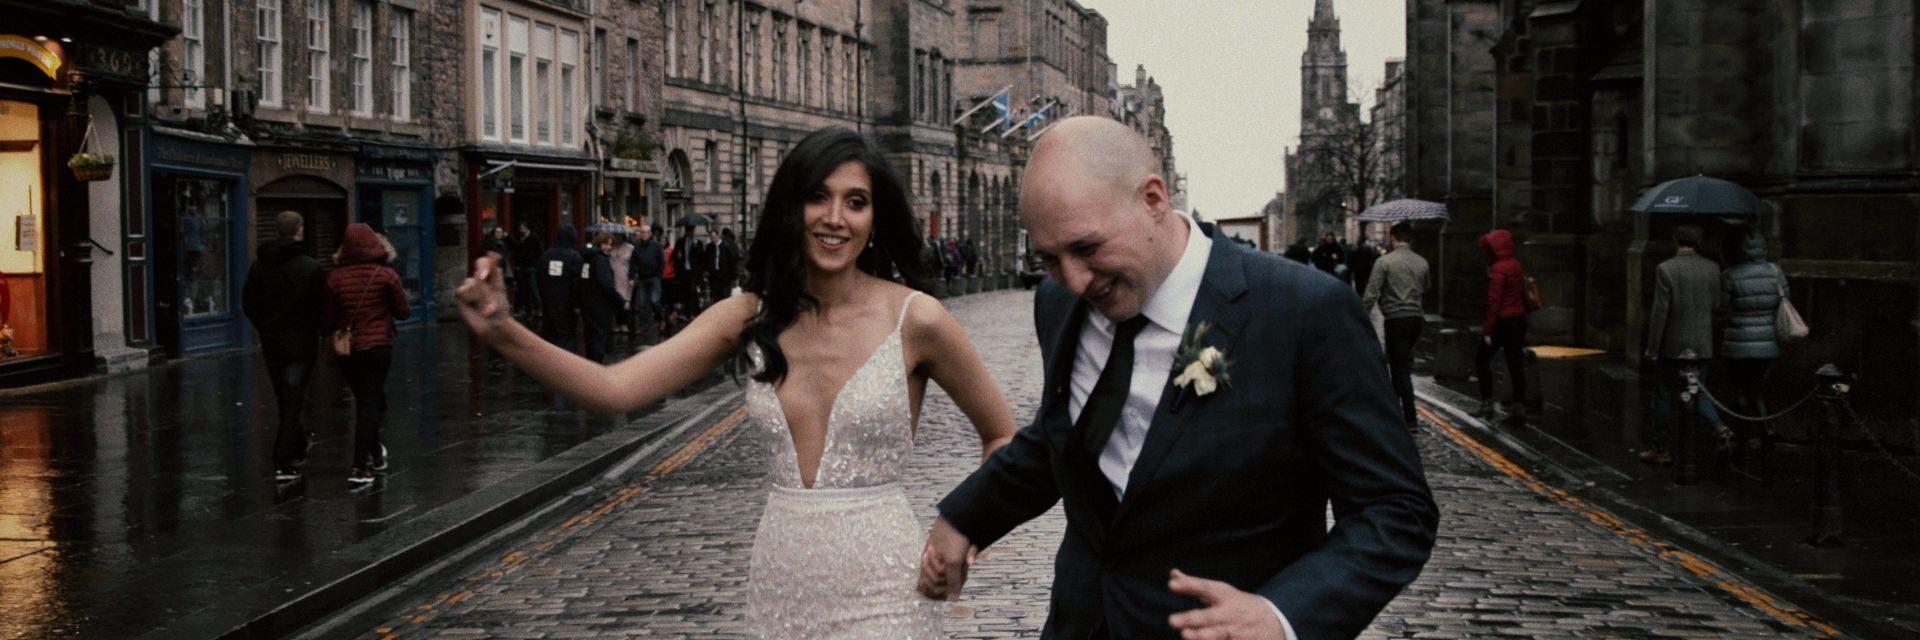 Piedmont-wedding-videographer-cinemate-films-04